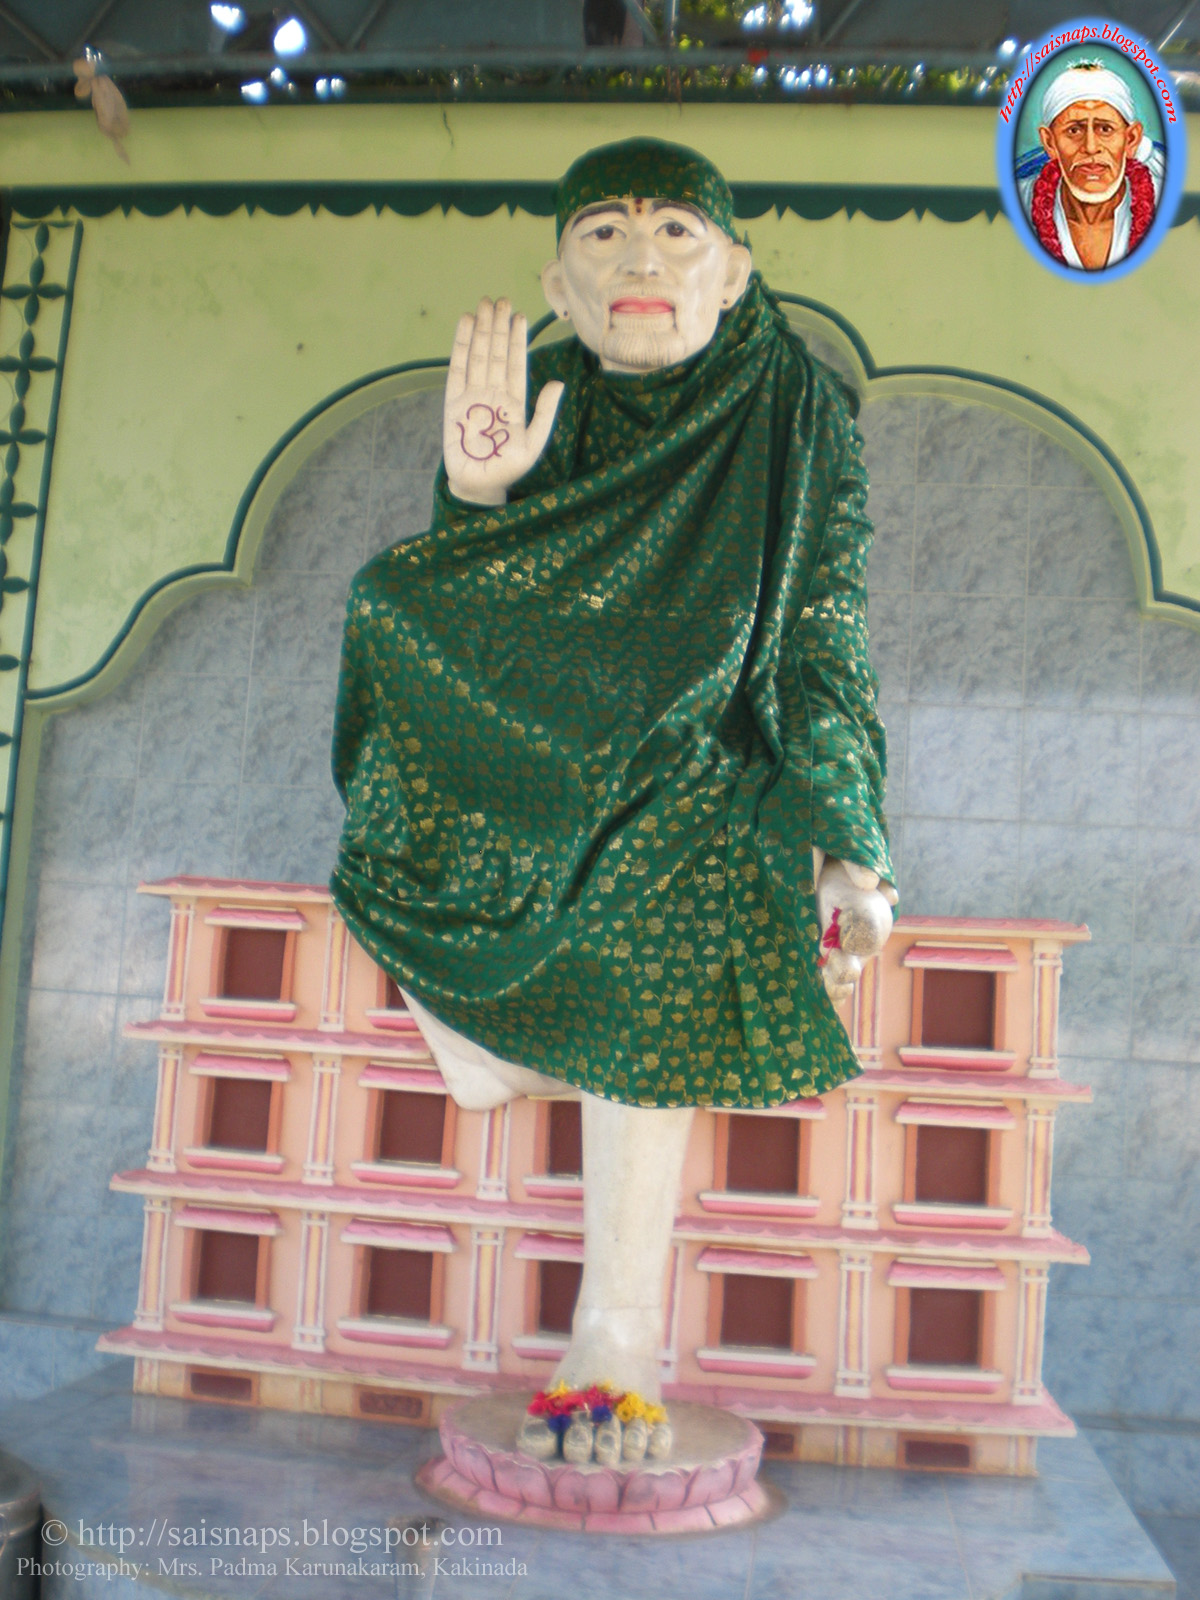 Sai Wallpaper: 100ft Statue of Sai Baba at Shirdi Sai Baba